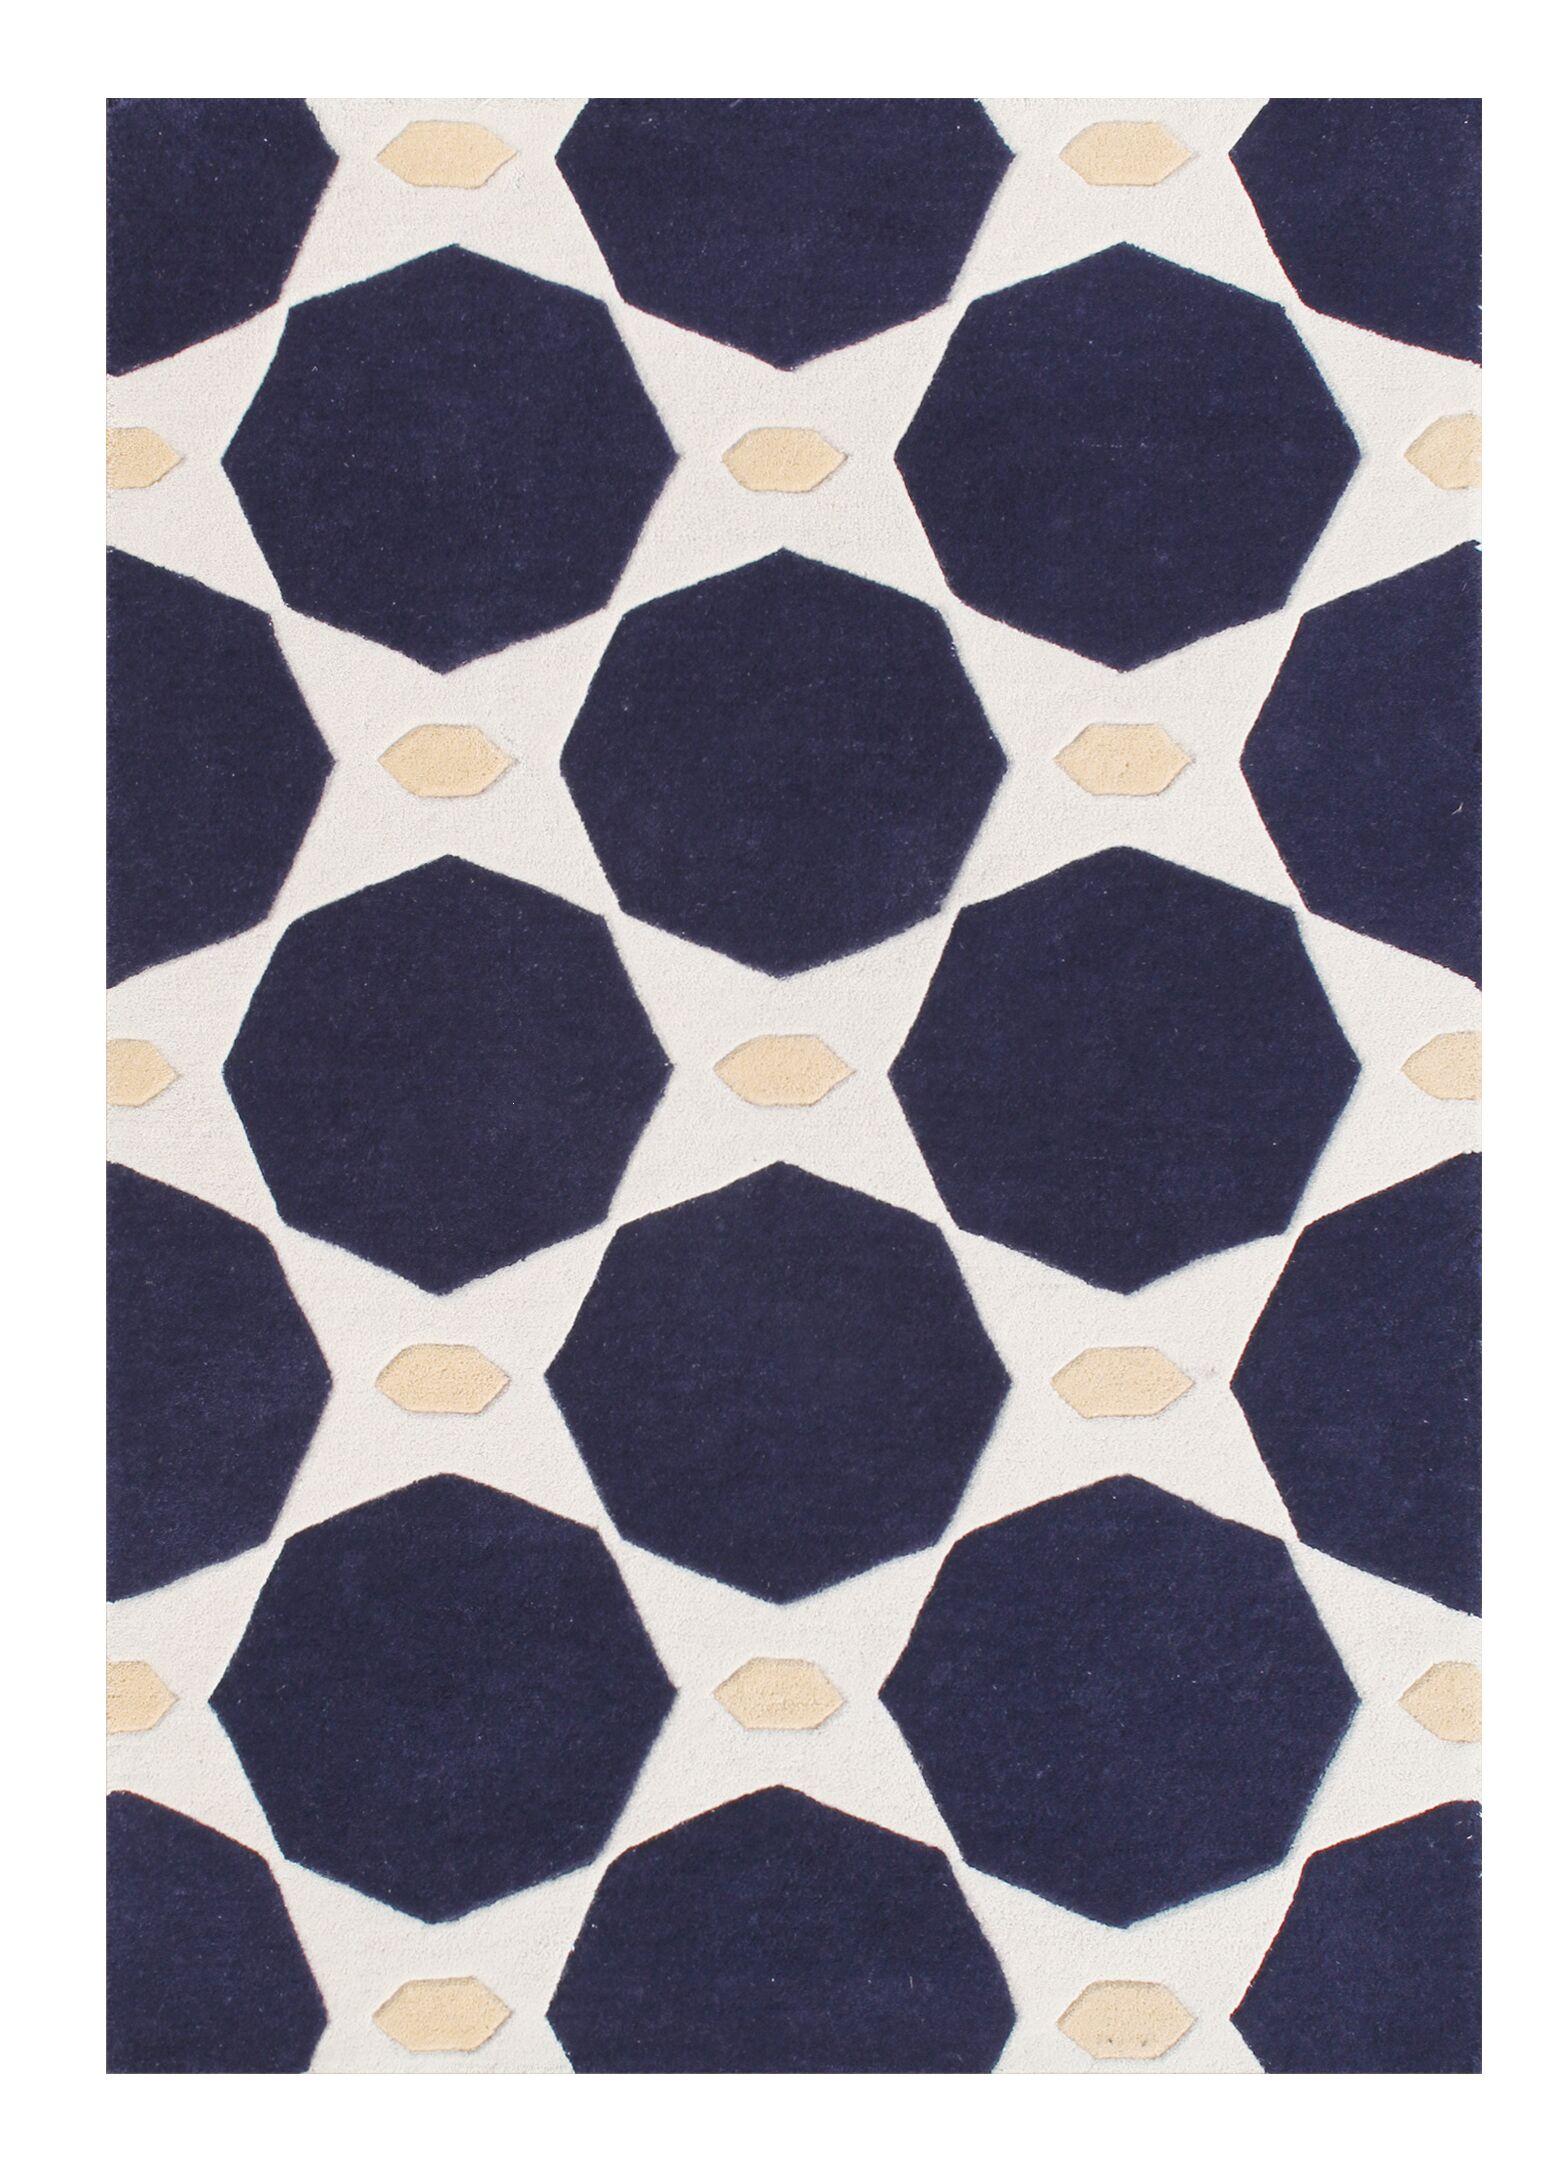 Eilean Modern Spirit Hand-Tufted Wool Black Area Rug Rug Size: Rectangle 8' x 10'